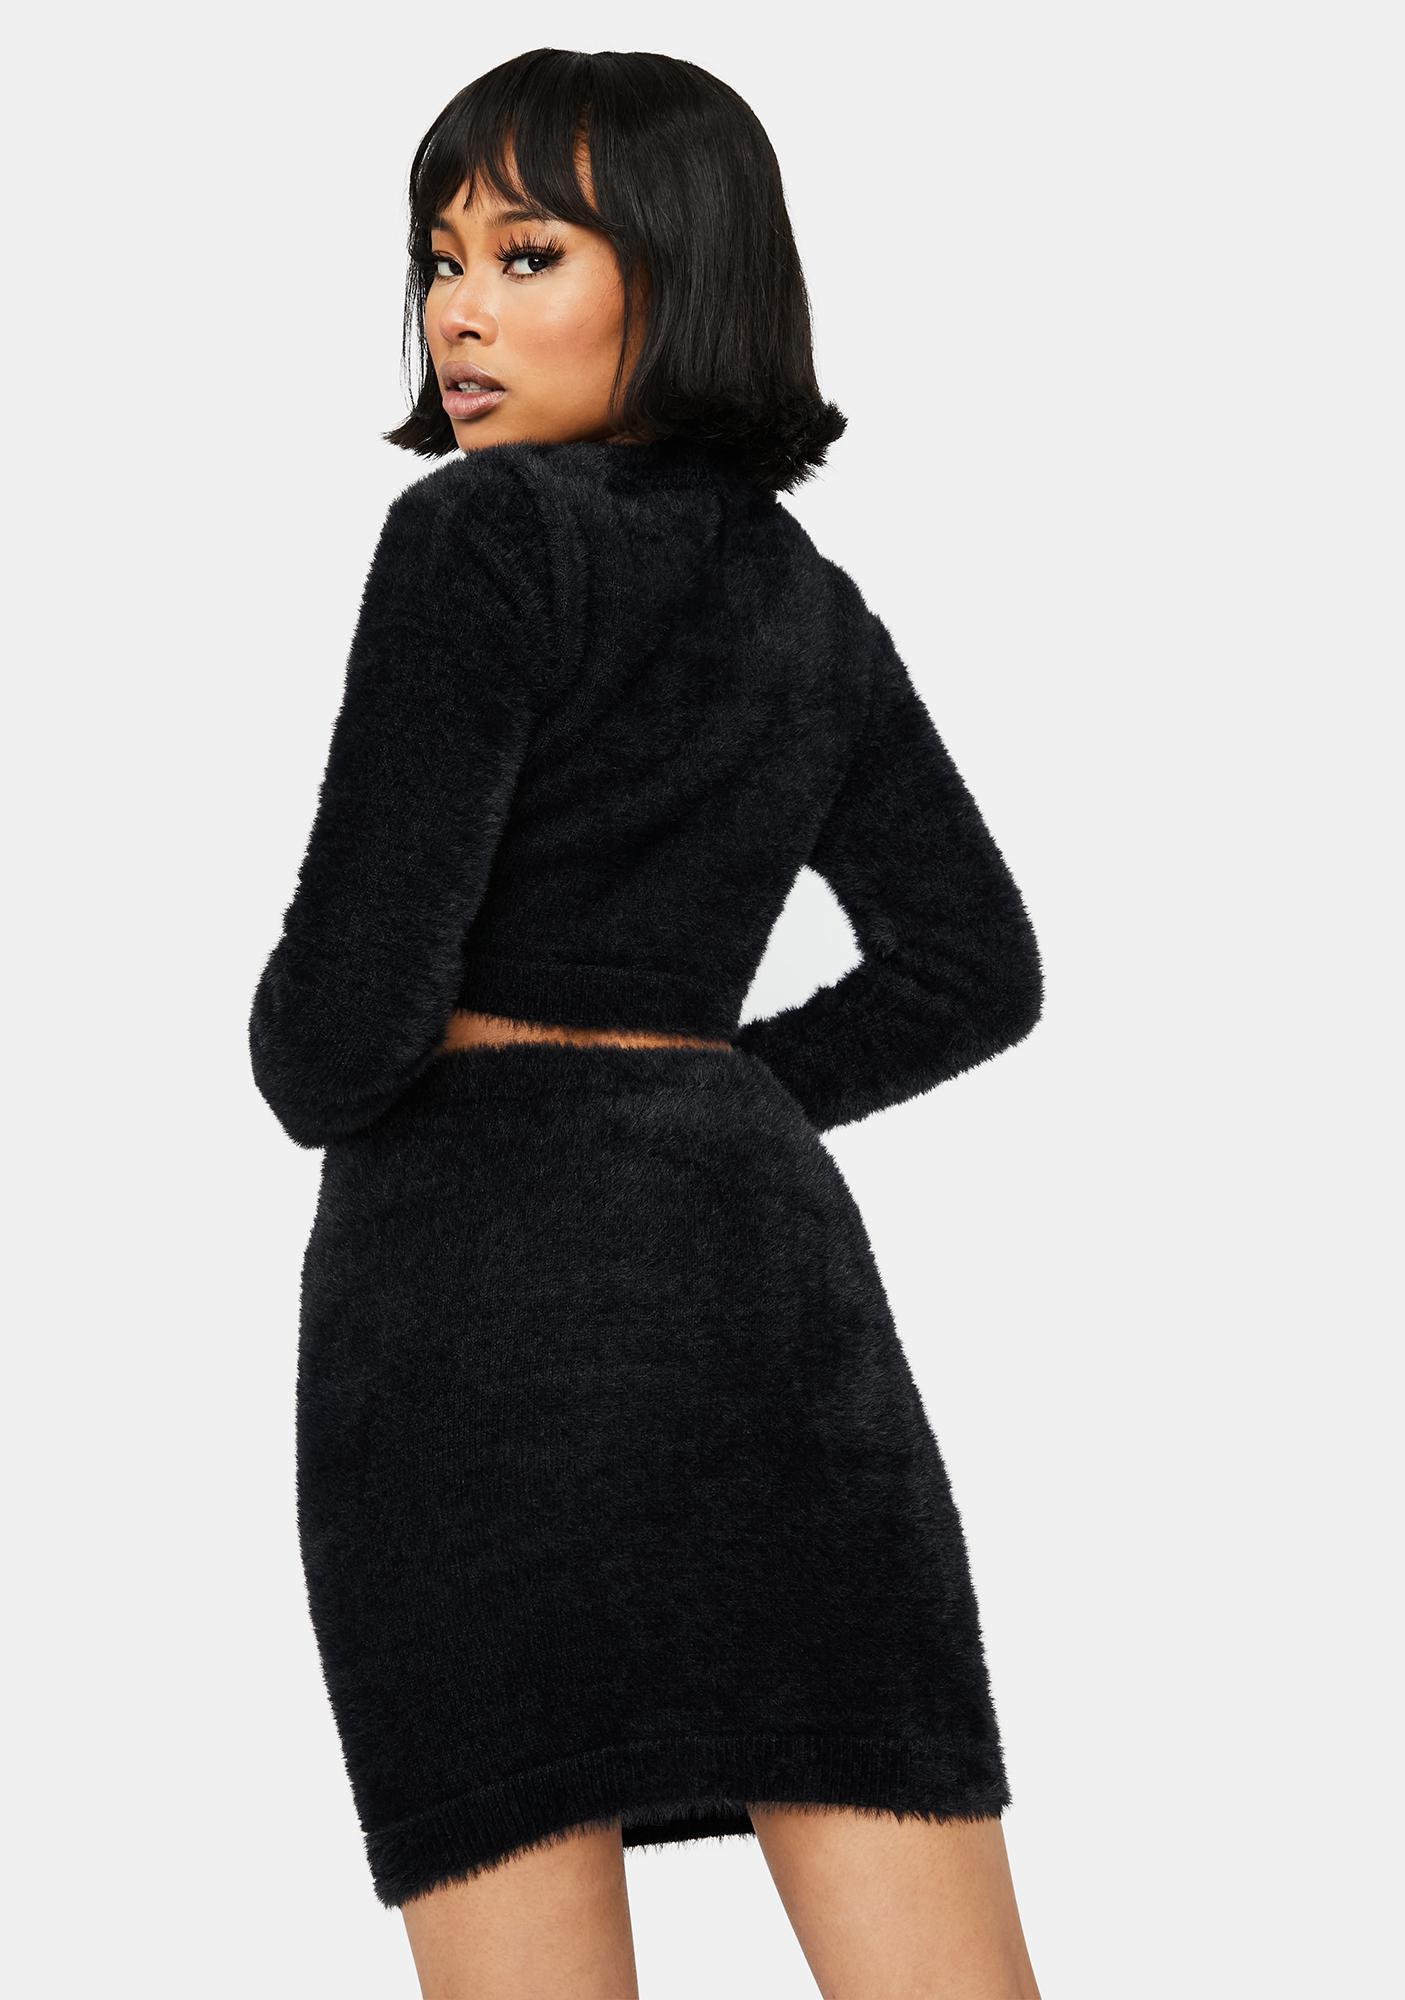 Night Bratty Confessions Fuzzy Skirt Set